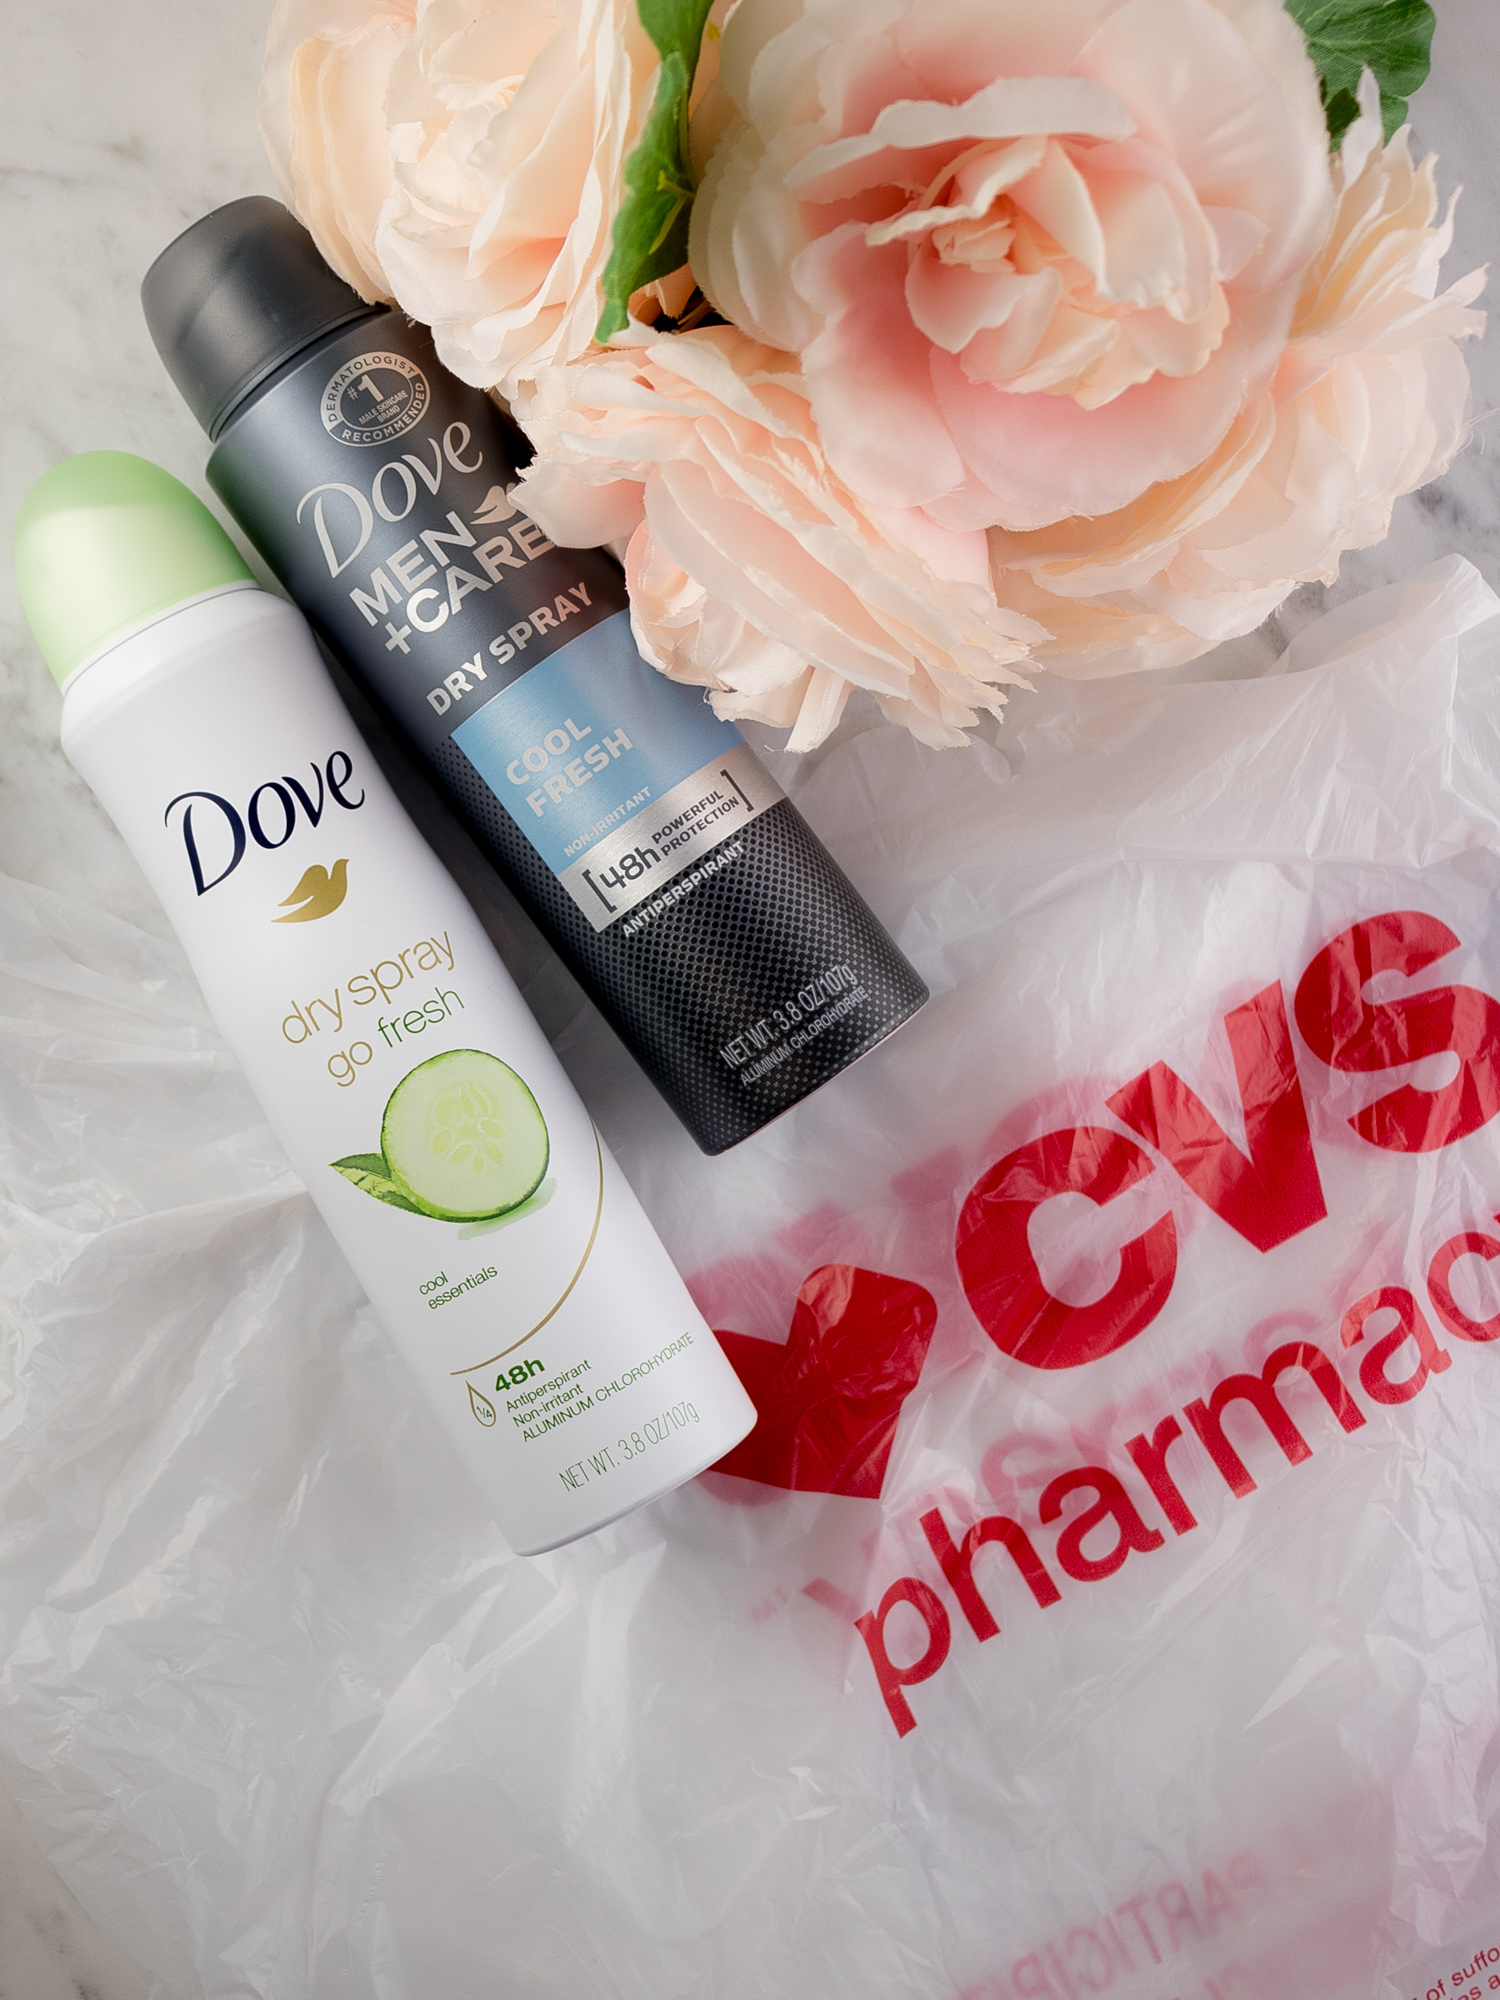 Dove Dry Sprays from CVS